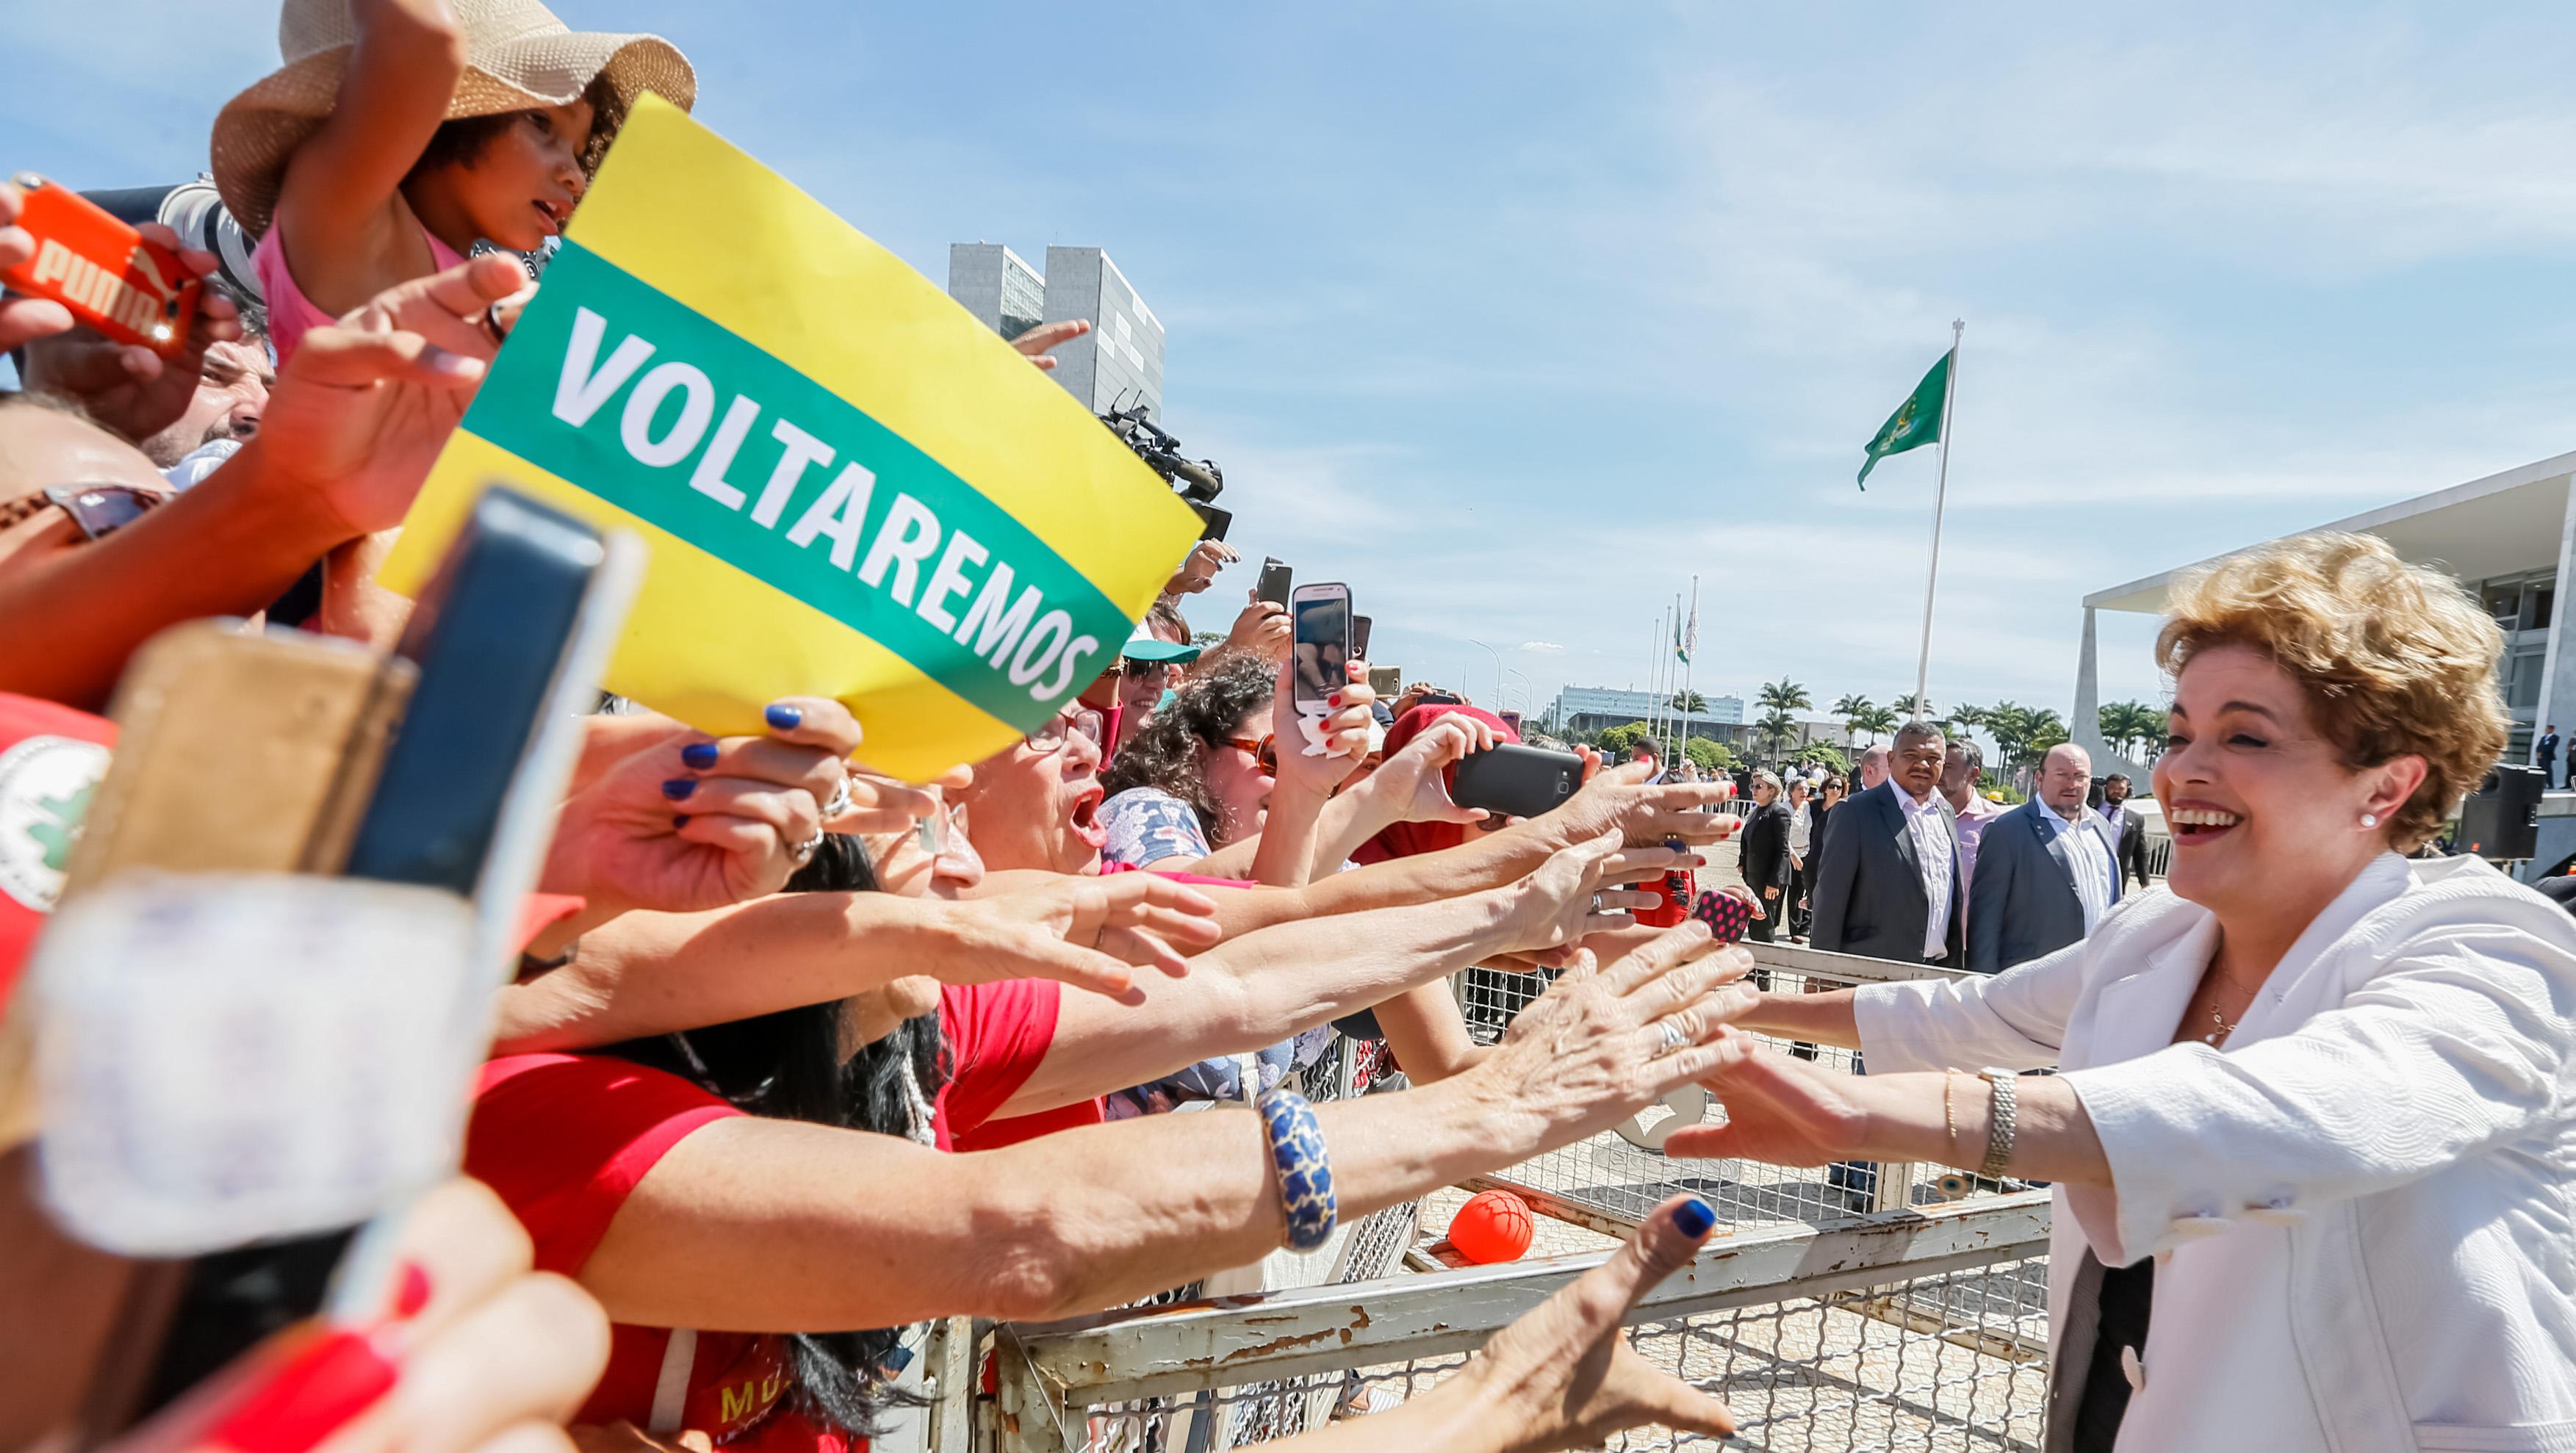 Dilma se emociona, ataca PMDB e diz ser vítima de golpe